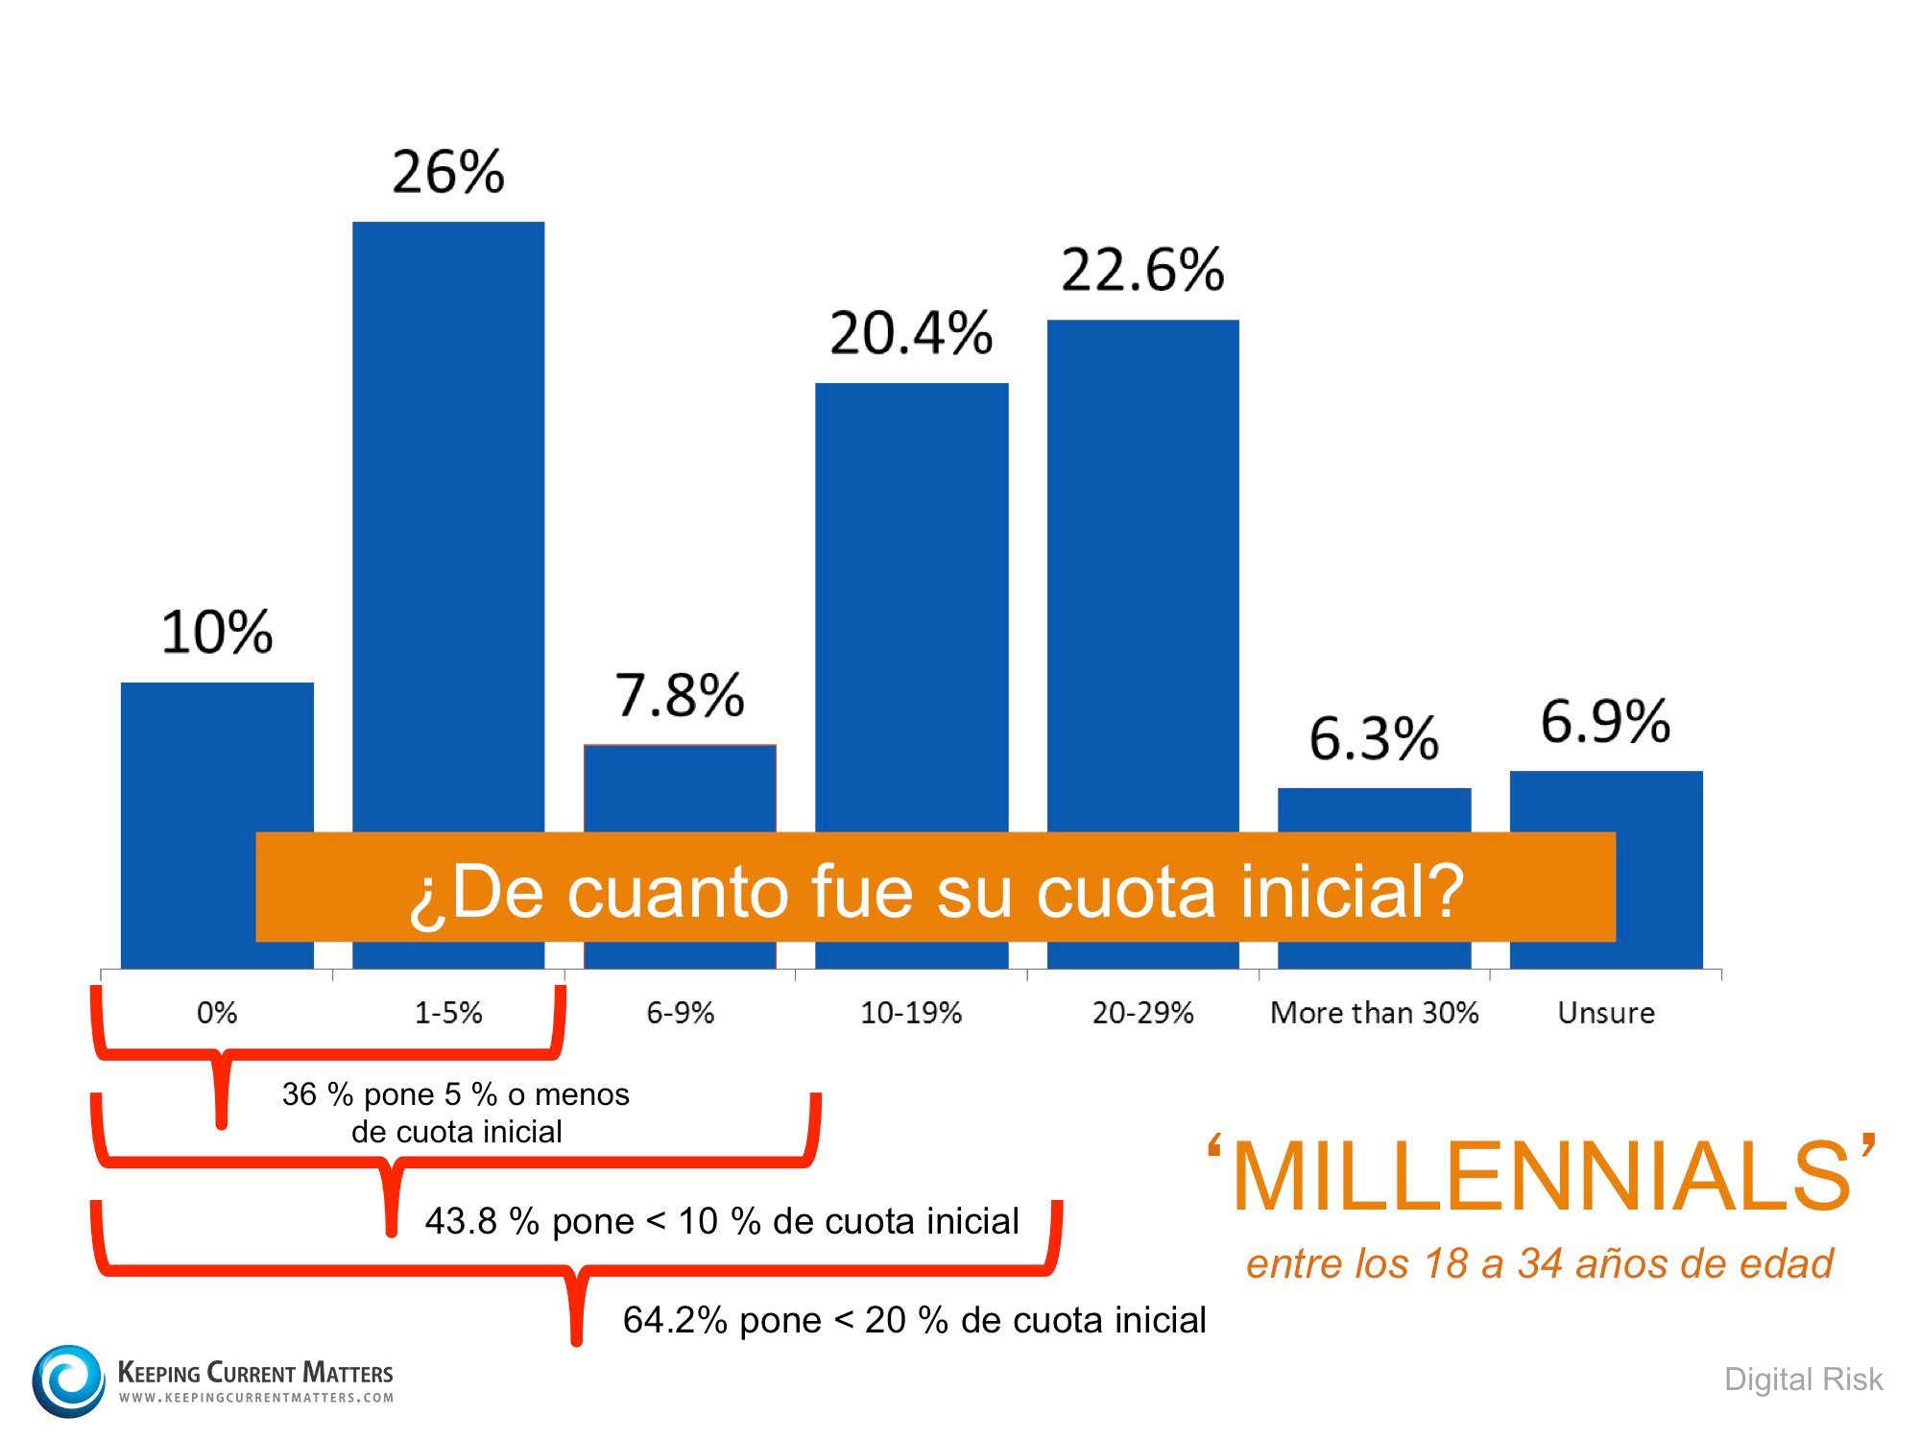 Millennials cuota inicial | Keeping Current Matters